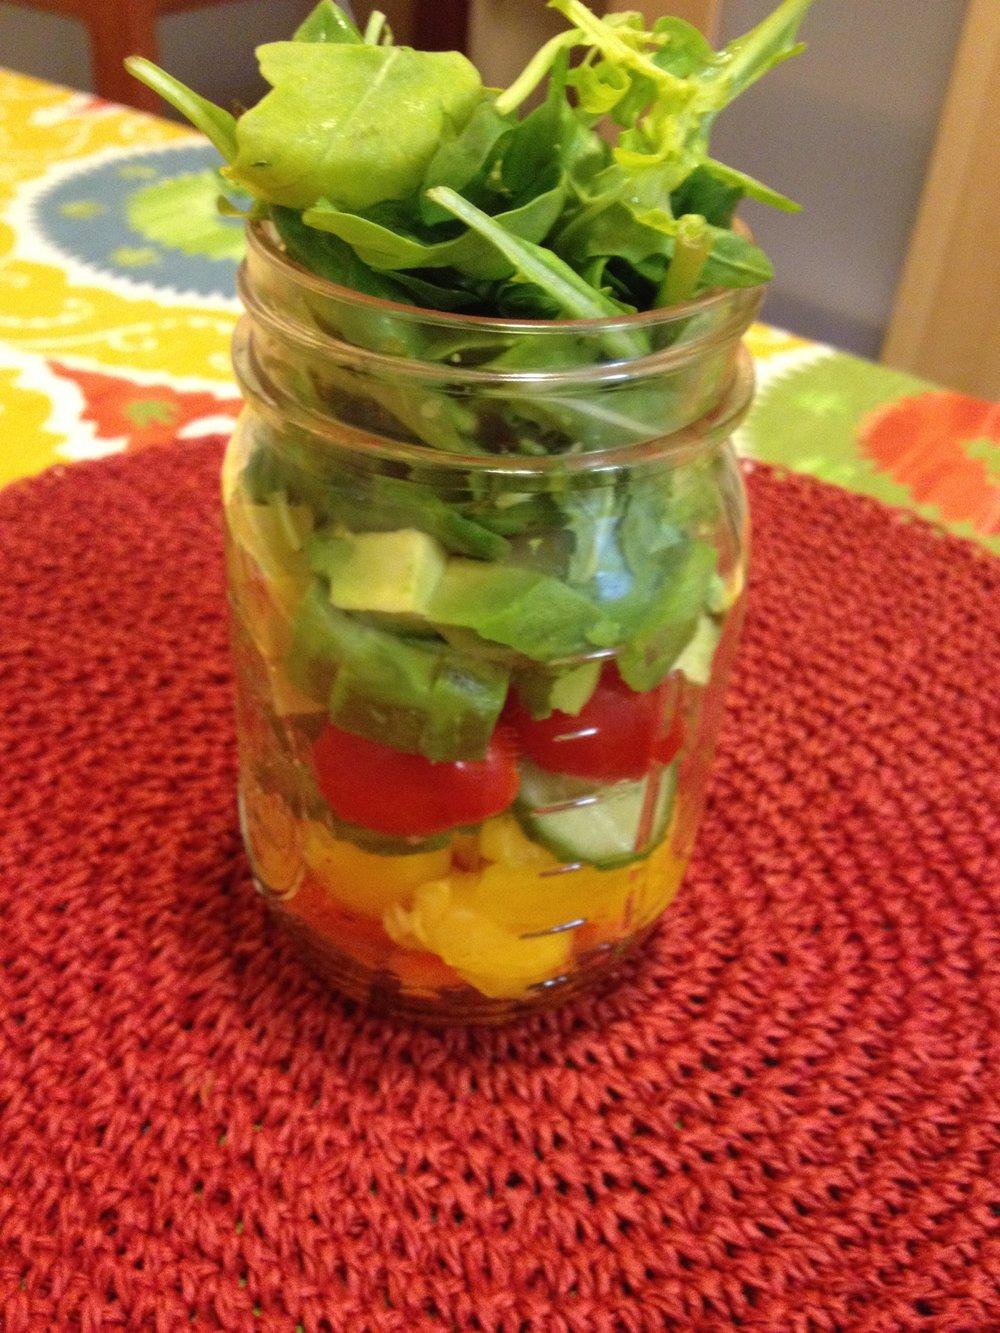 tomato avocado arugula cuccumber salad